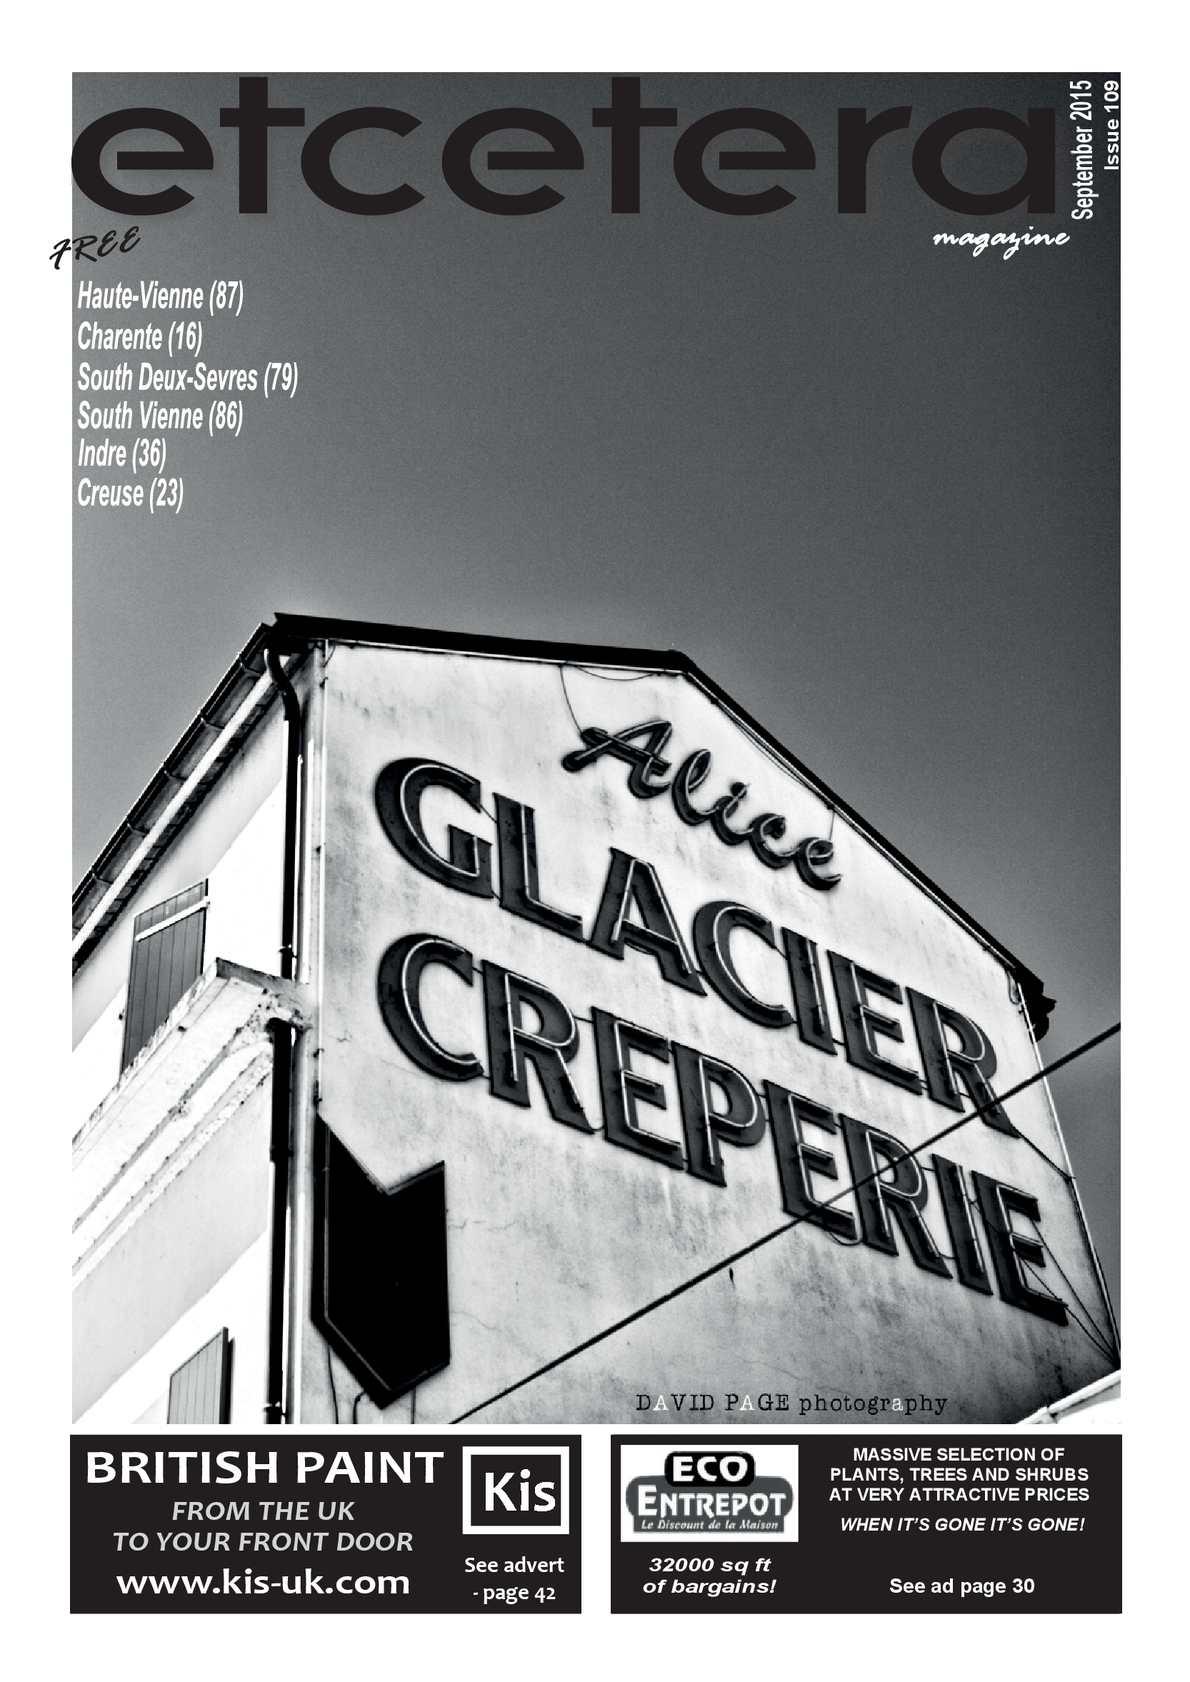 Carrelage Baker Street Blanc calaméo - etcetera magazine september 2015